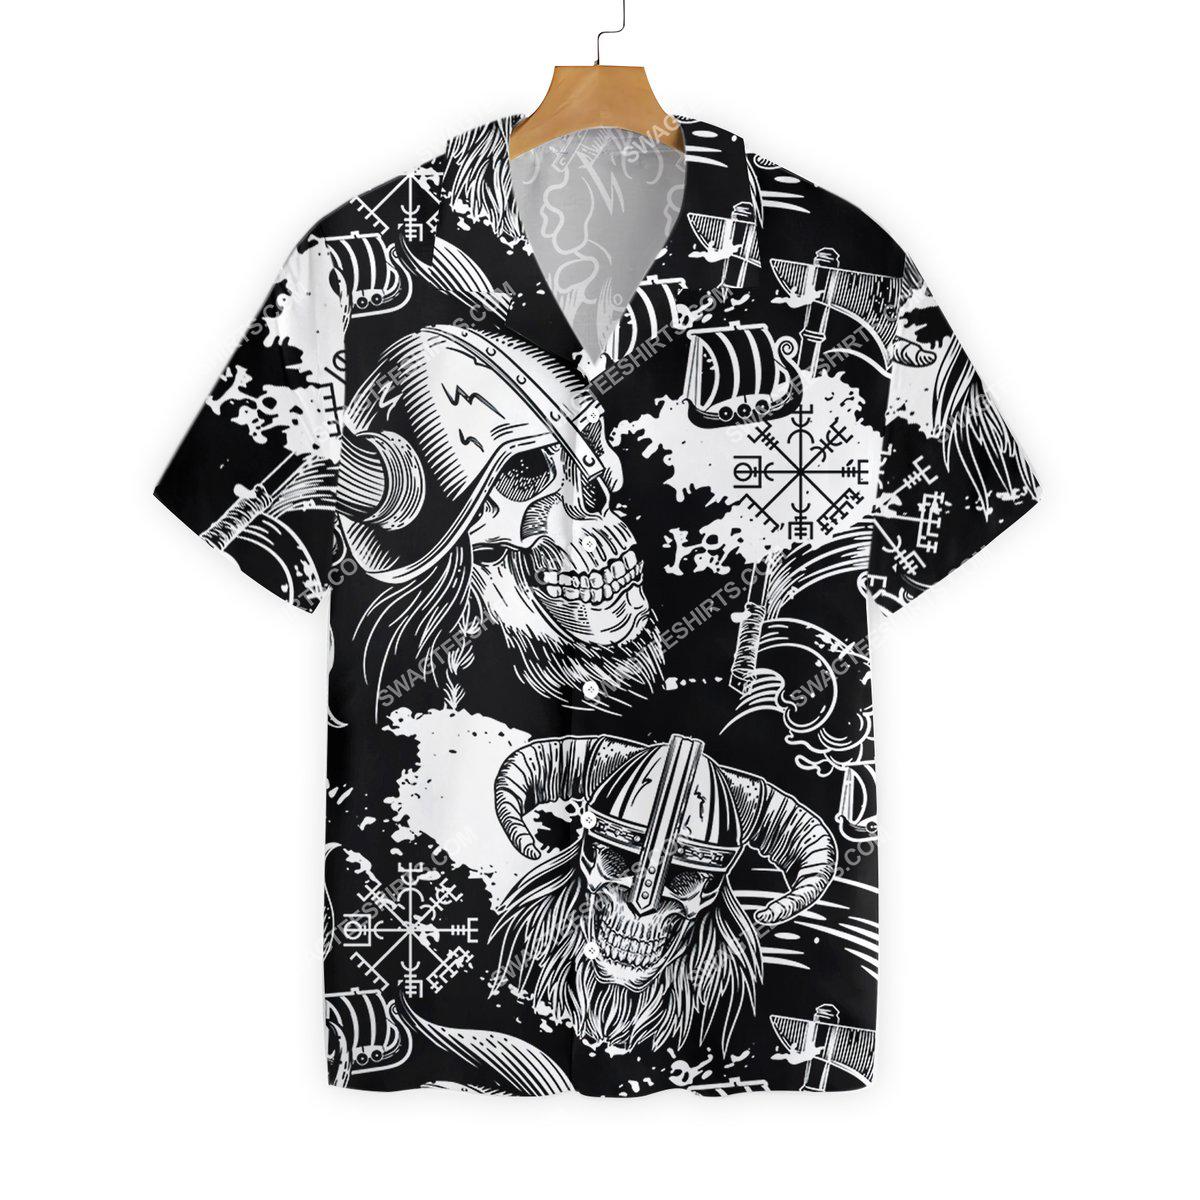 the viking warrior skull all over printed hawaiian shirt 2(1)